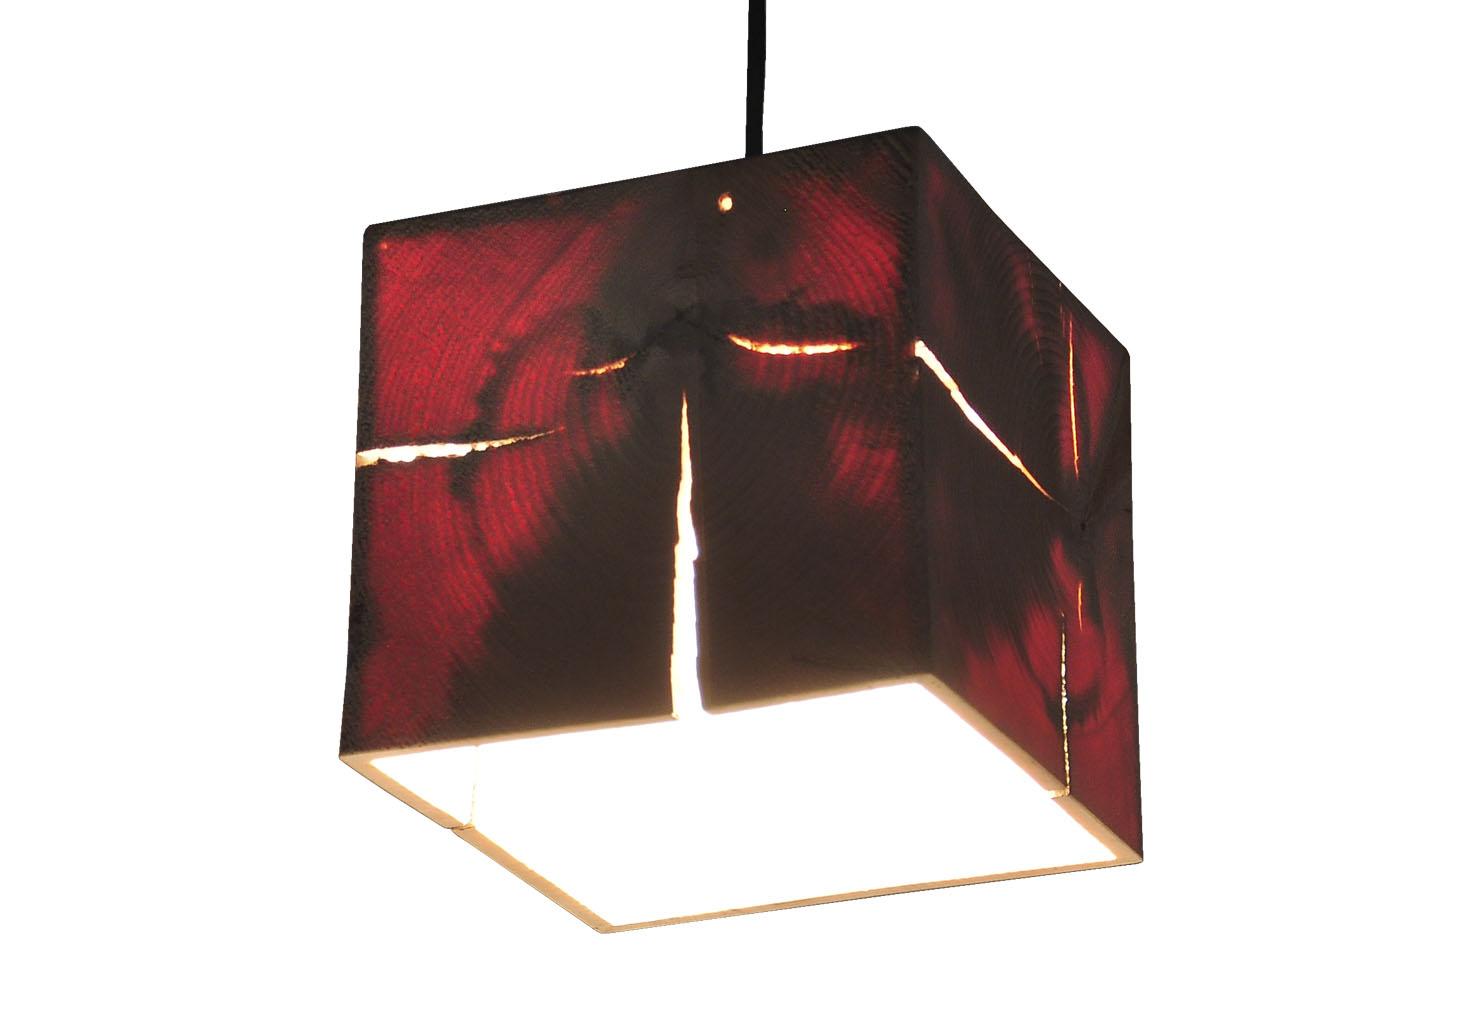 Almleuchten - Design Lampen aus Altholz